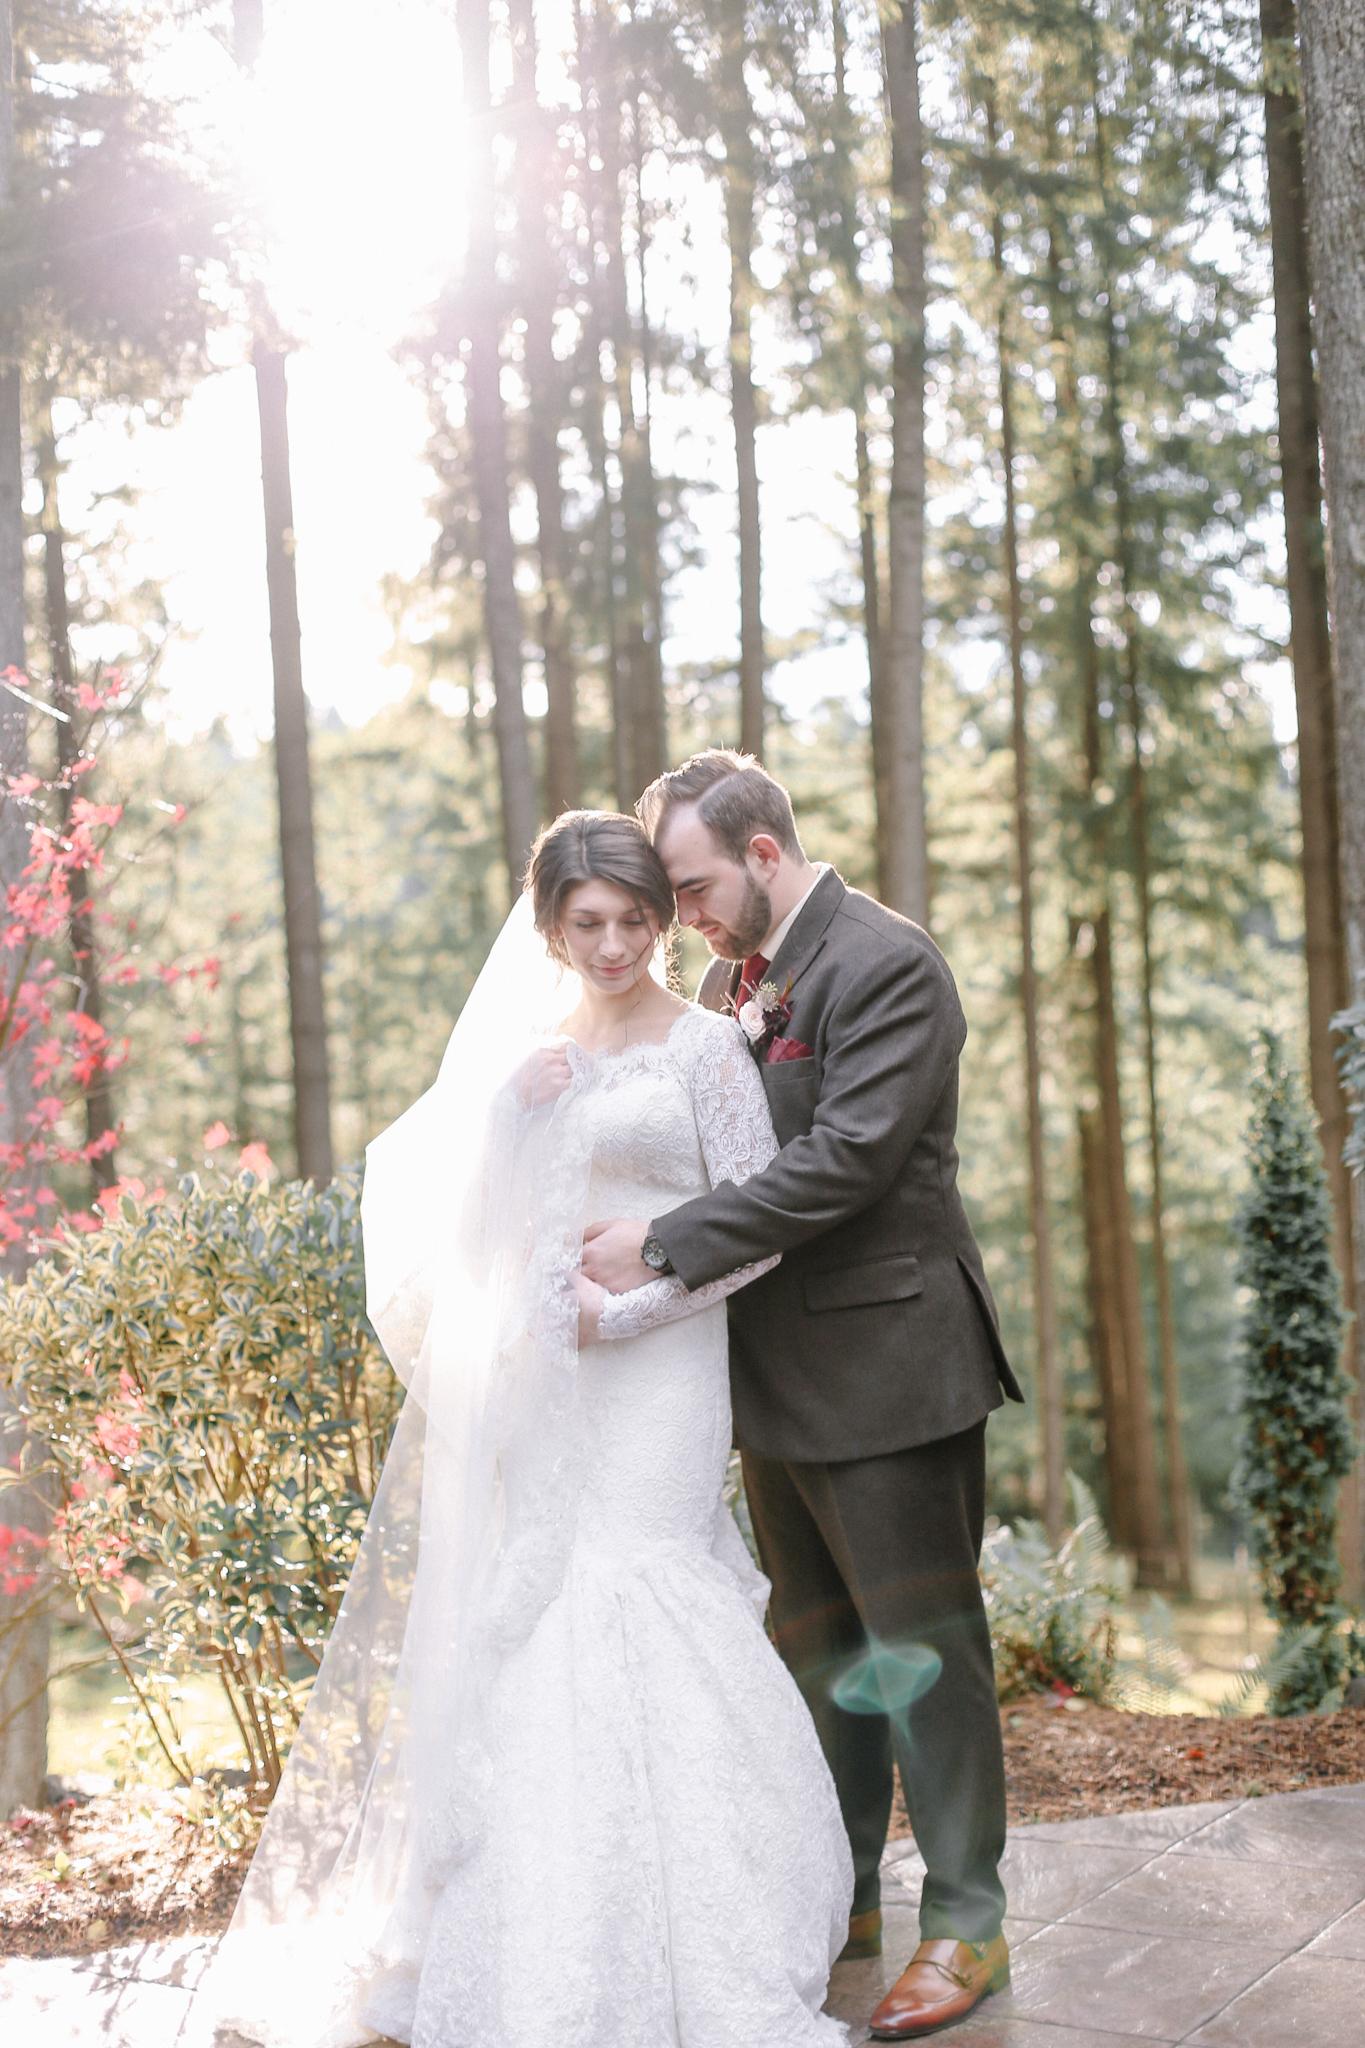 Manu and Laura - Portland Wedding Photographer - 38.jpg